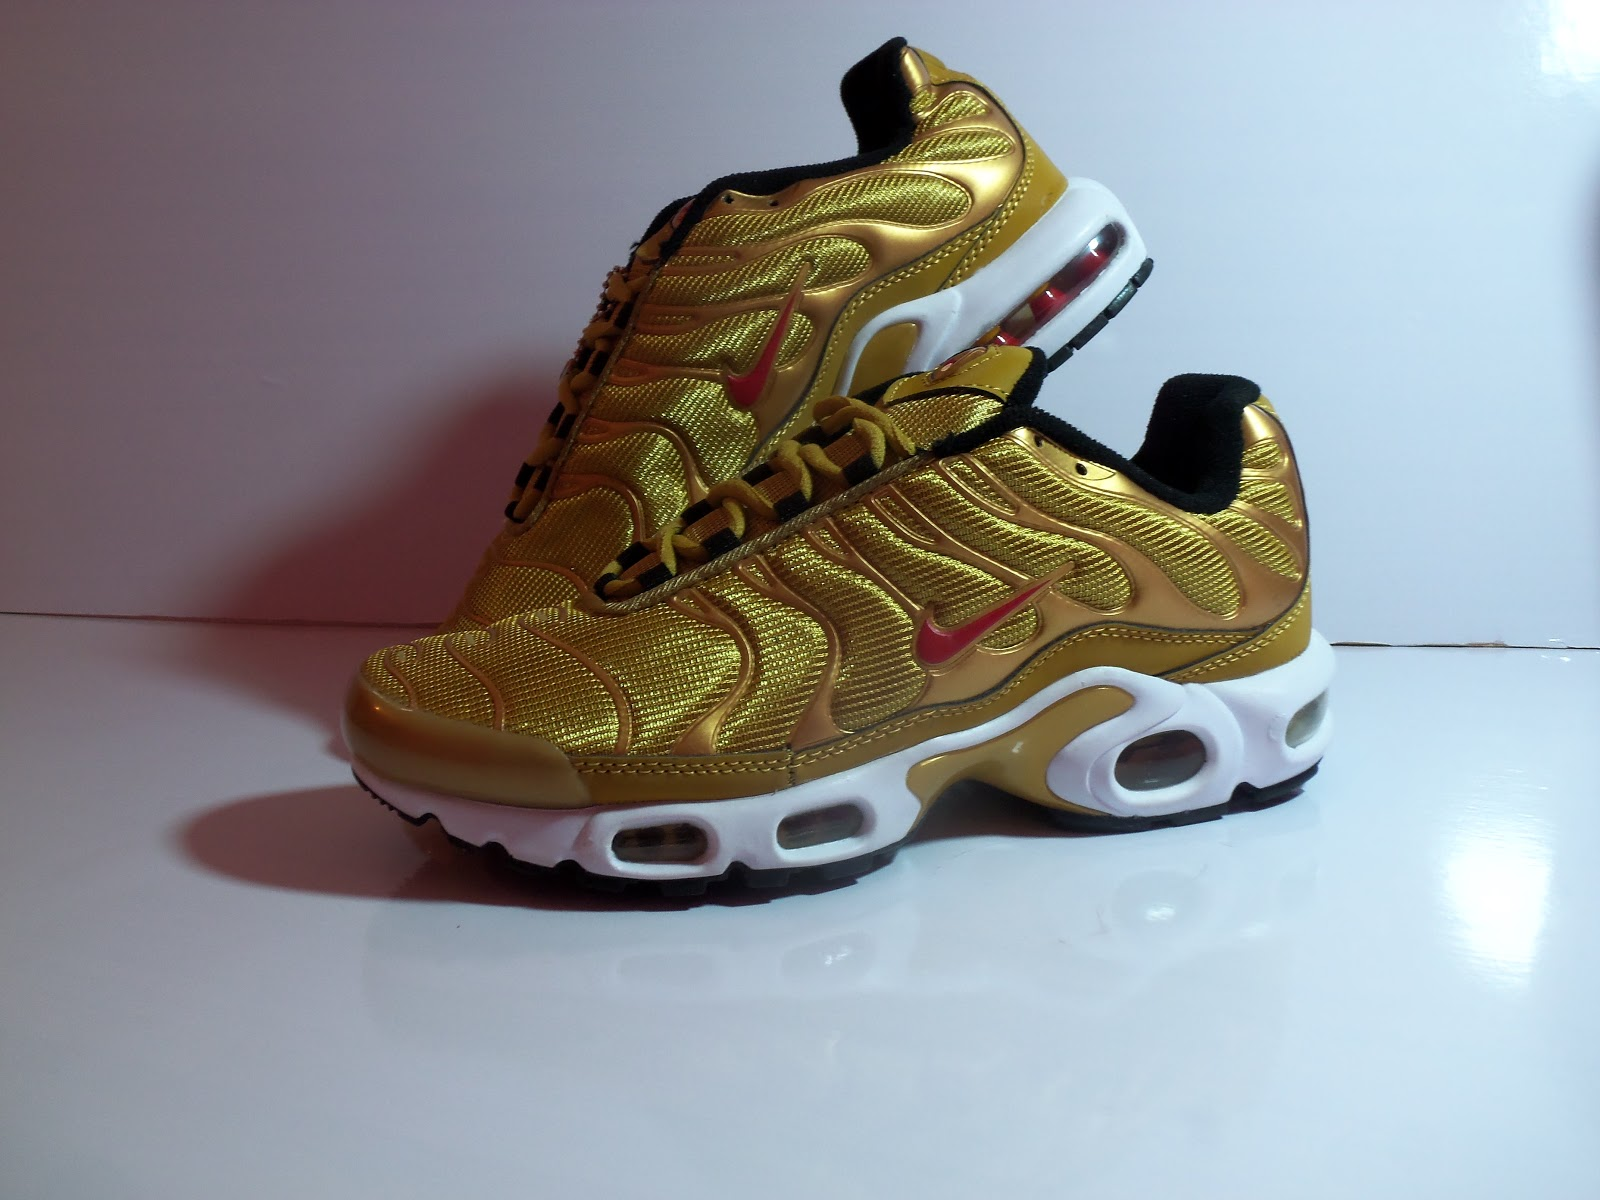 c06be4746853 Nike Air Max Plus QS TN Tuned 1 Metallic Gold Bullet Red Mens 8 US ...